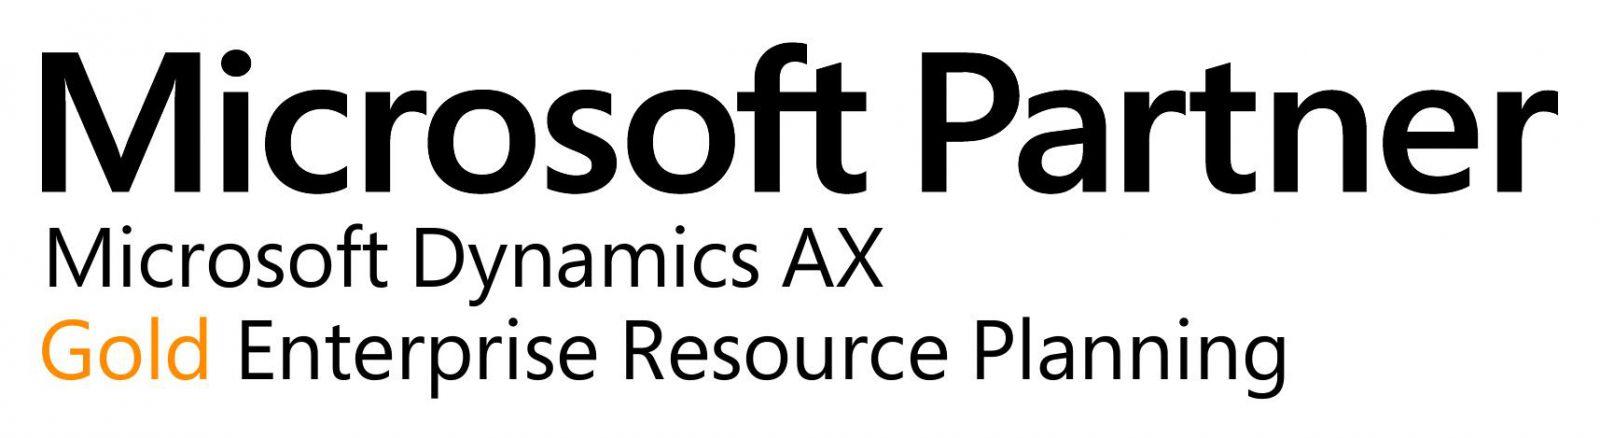 Microsoft Dynamics AX | Microsoft Partner